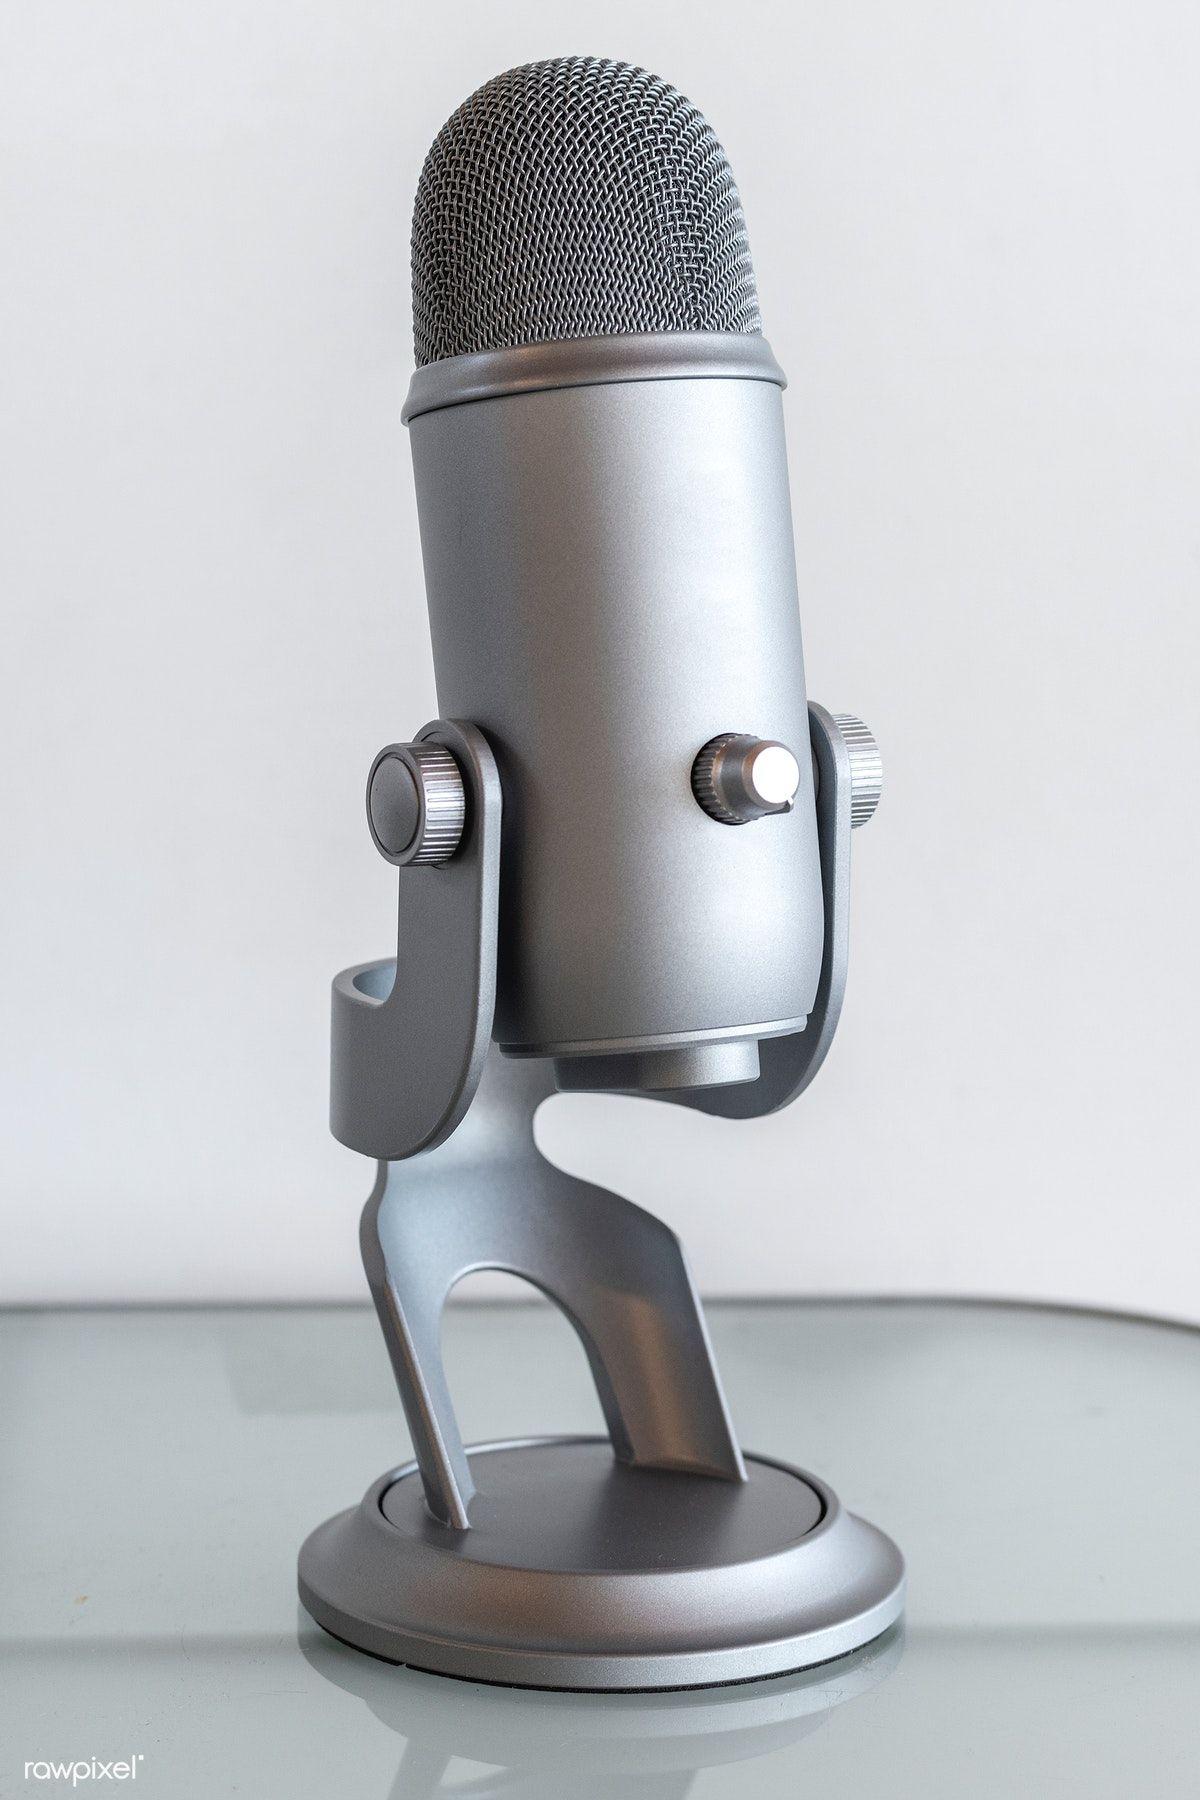 Studio microphone for recording a podcast premium image